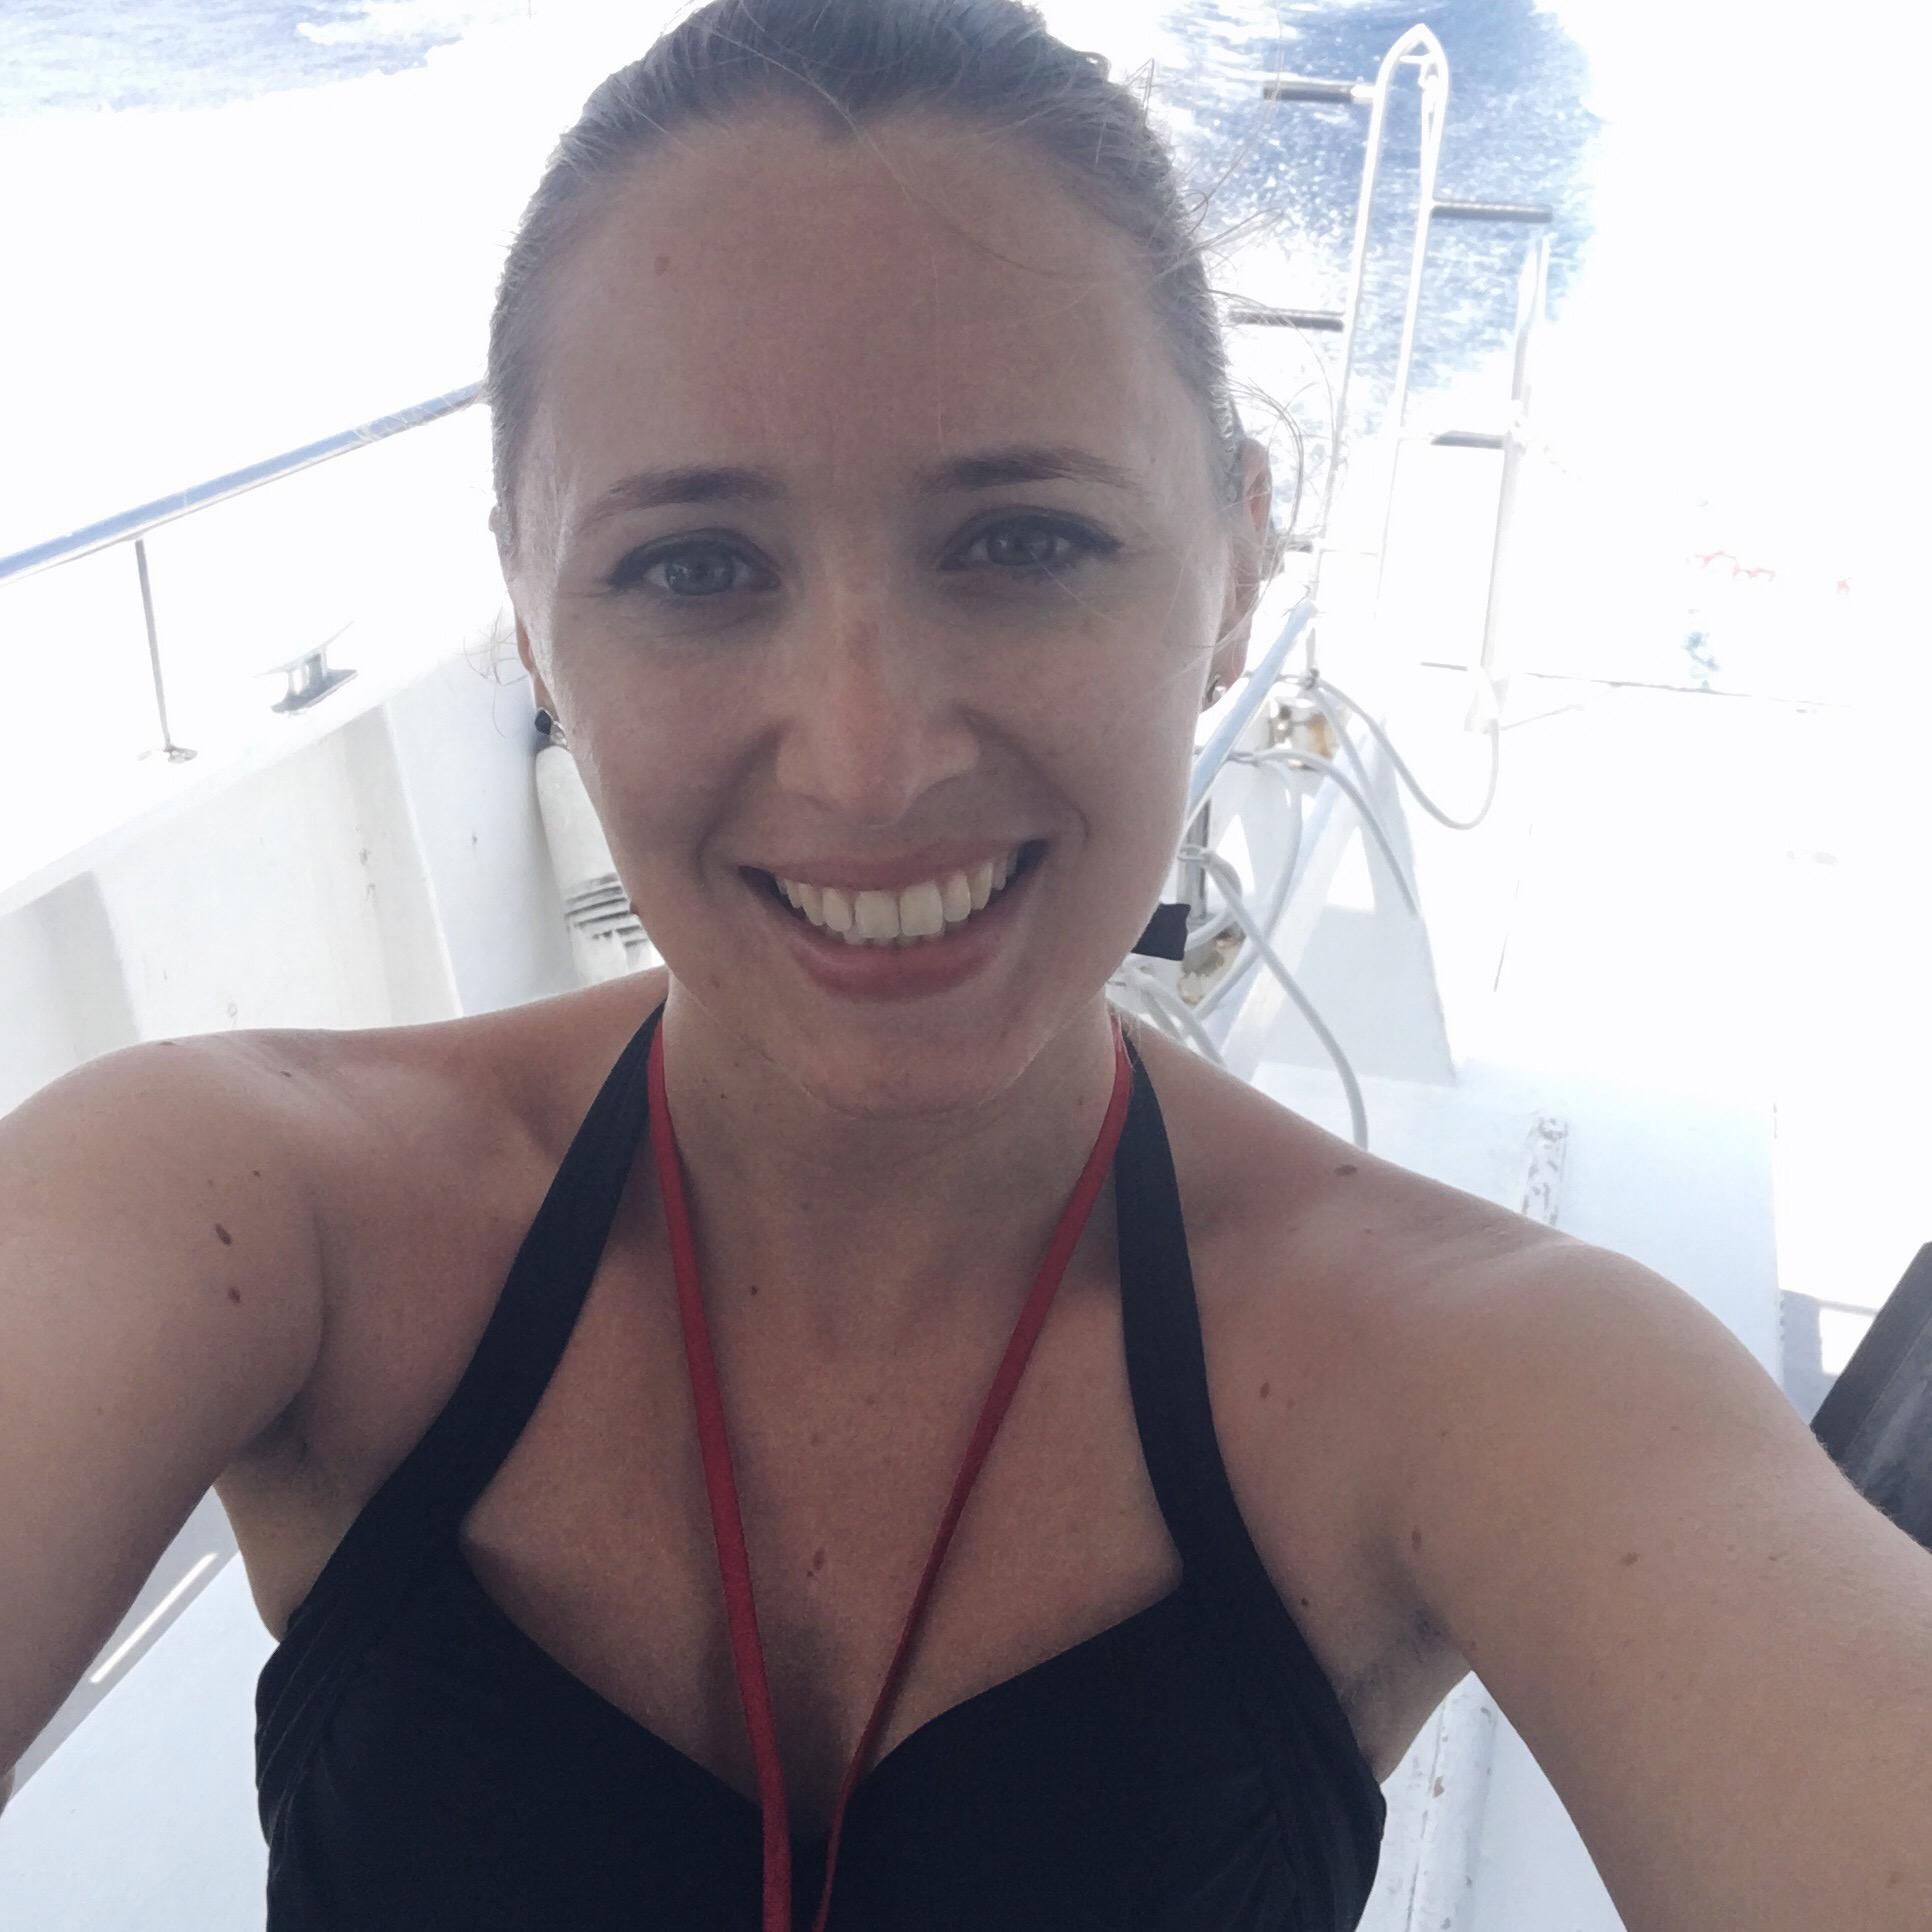 dune-la-londe-les-maures-porquerolles-plongée-snorkeling-bateau-selfie-smile-soprettylittlethings